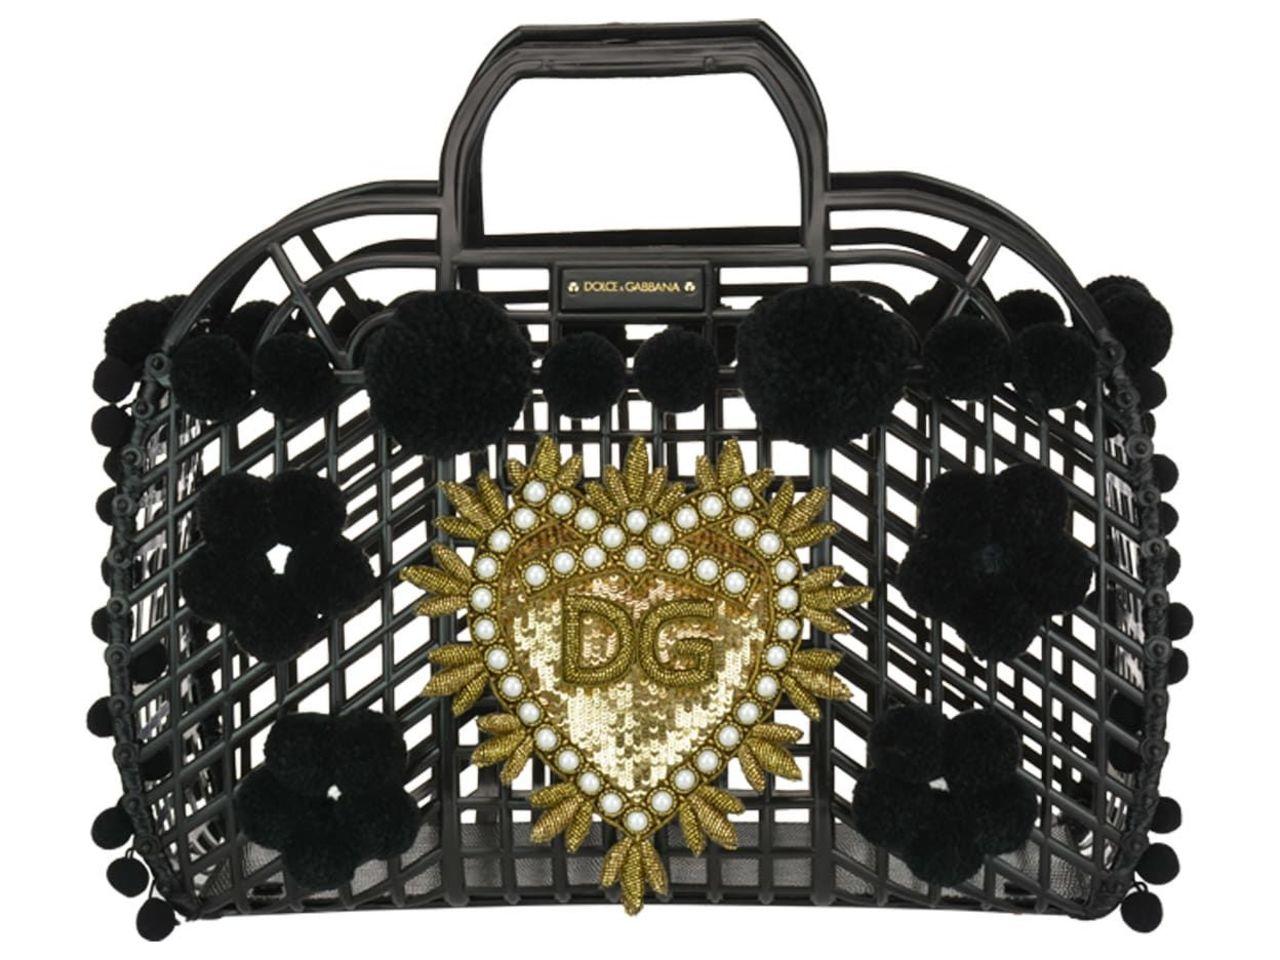 Dolce & Gabbana Kendra Shopping Bag